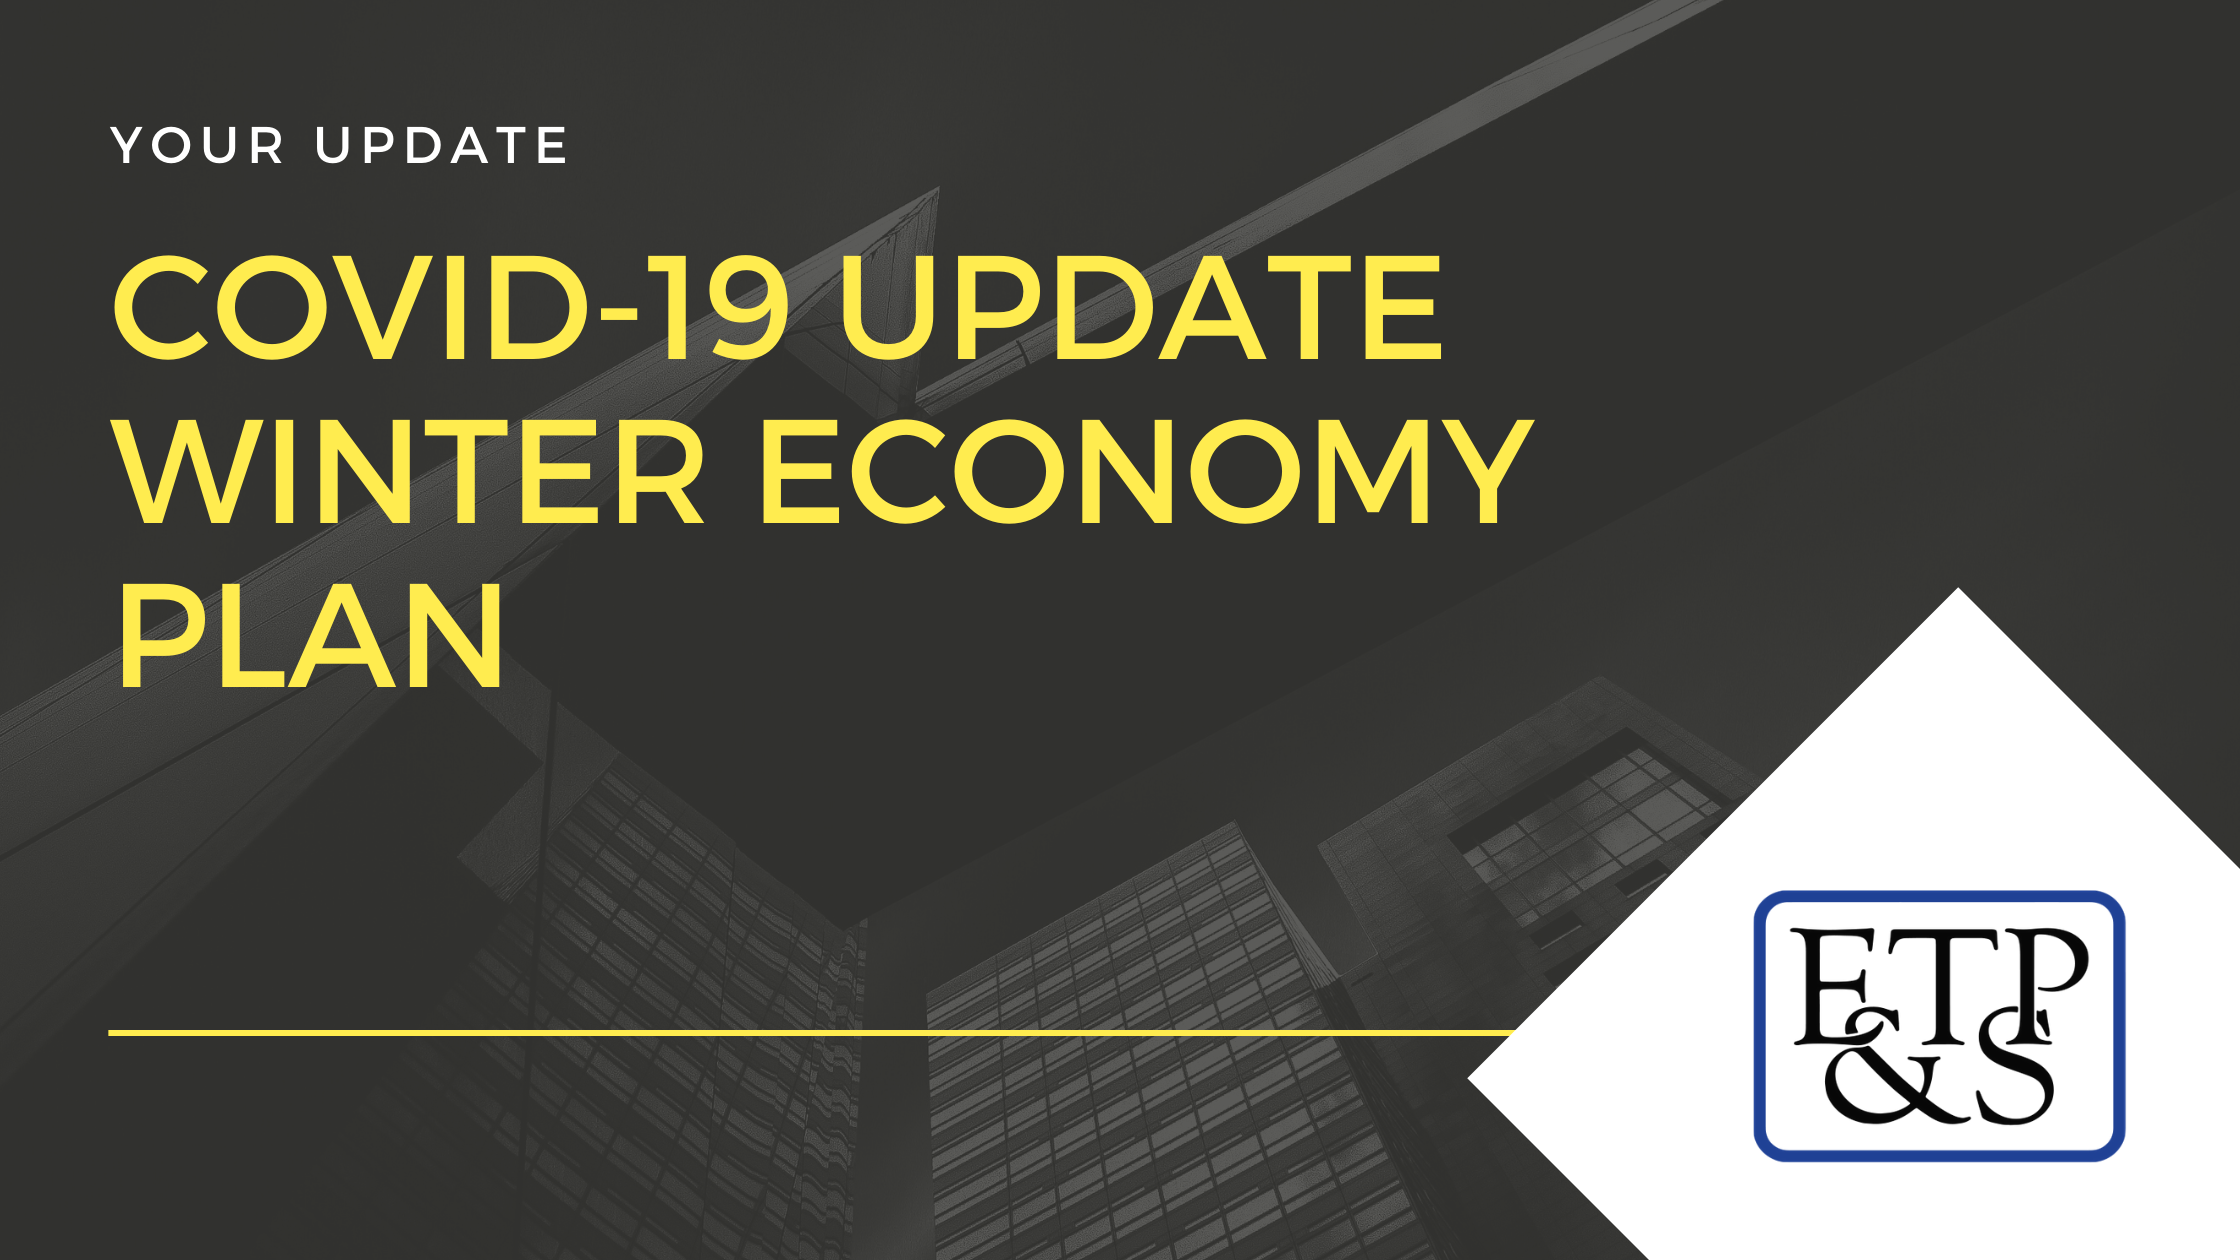 COVID 19 Update Winter Economy Plan 1 - Edward Thomas Peirson & Sons Accountants